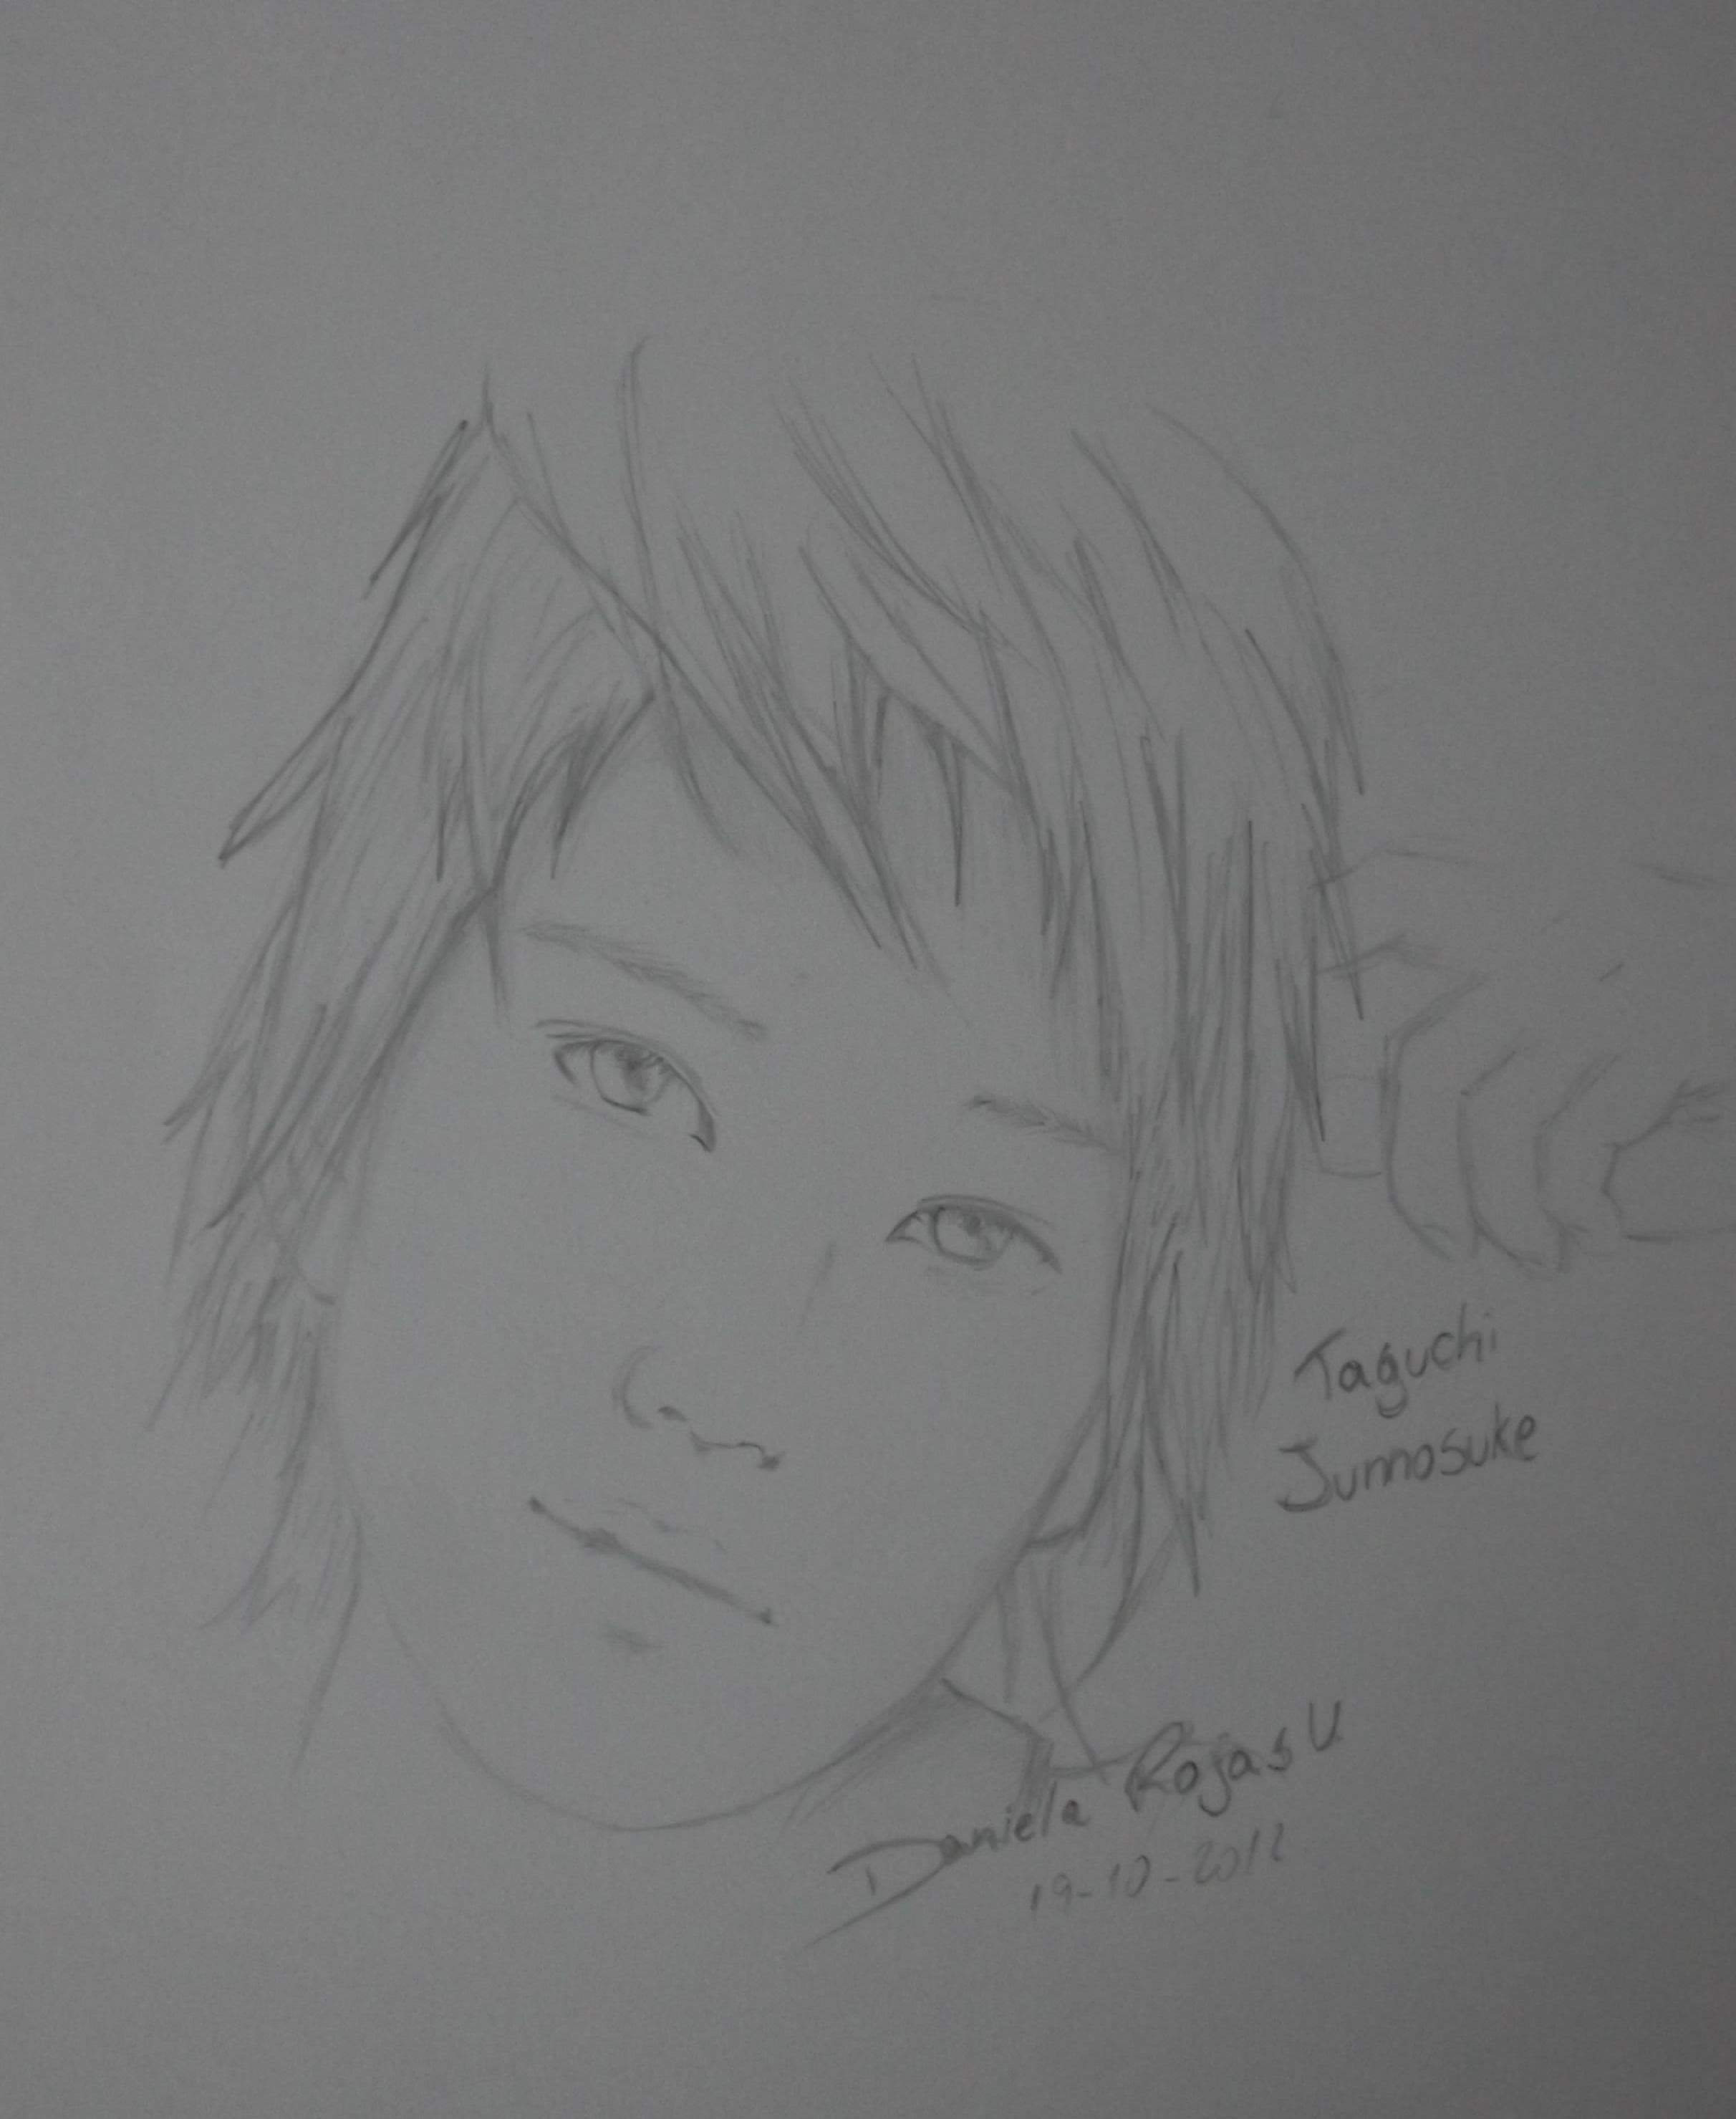 Taguchi 19-10-2012 Hikaru